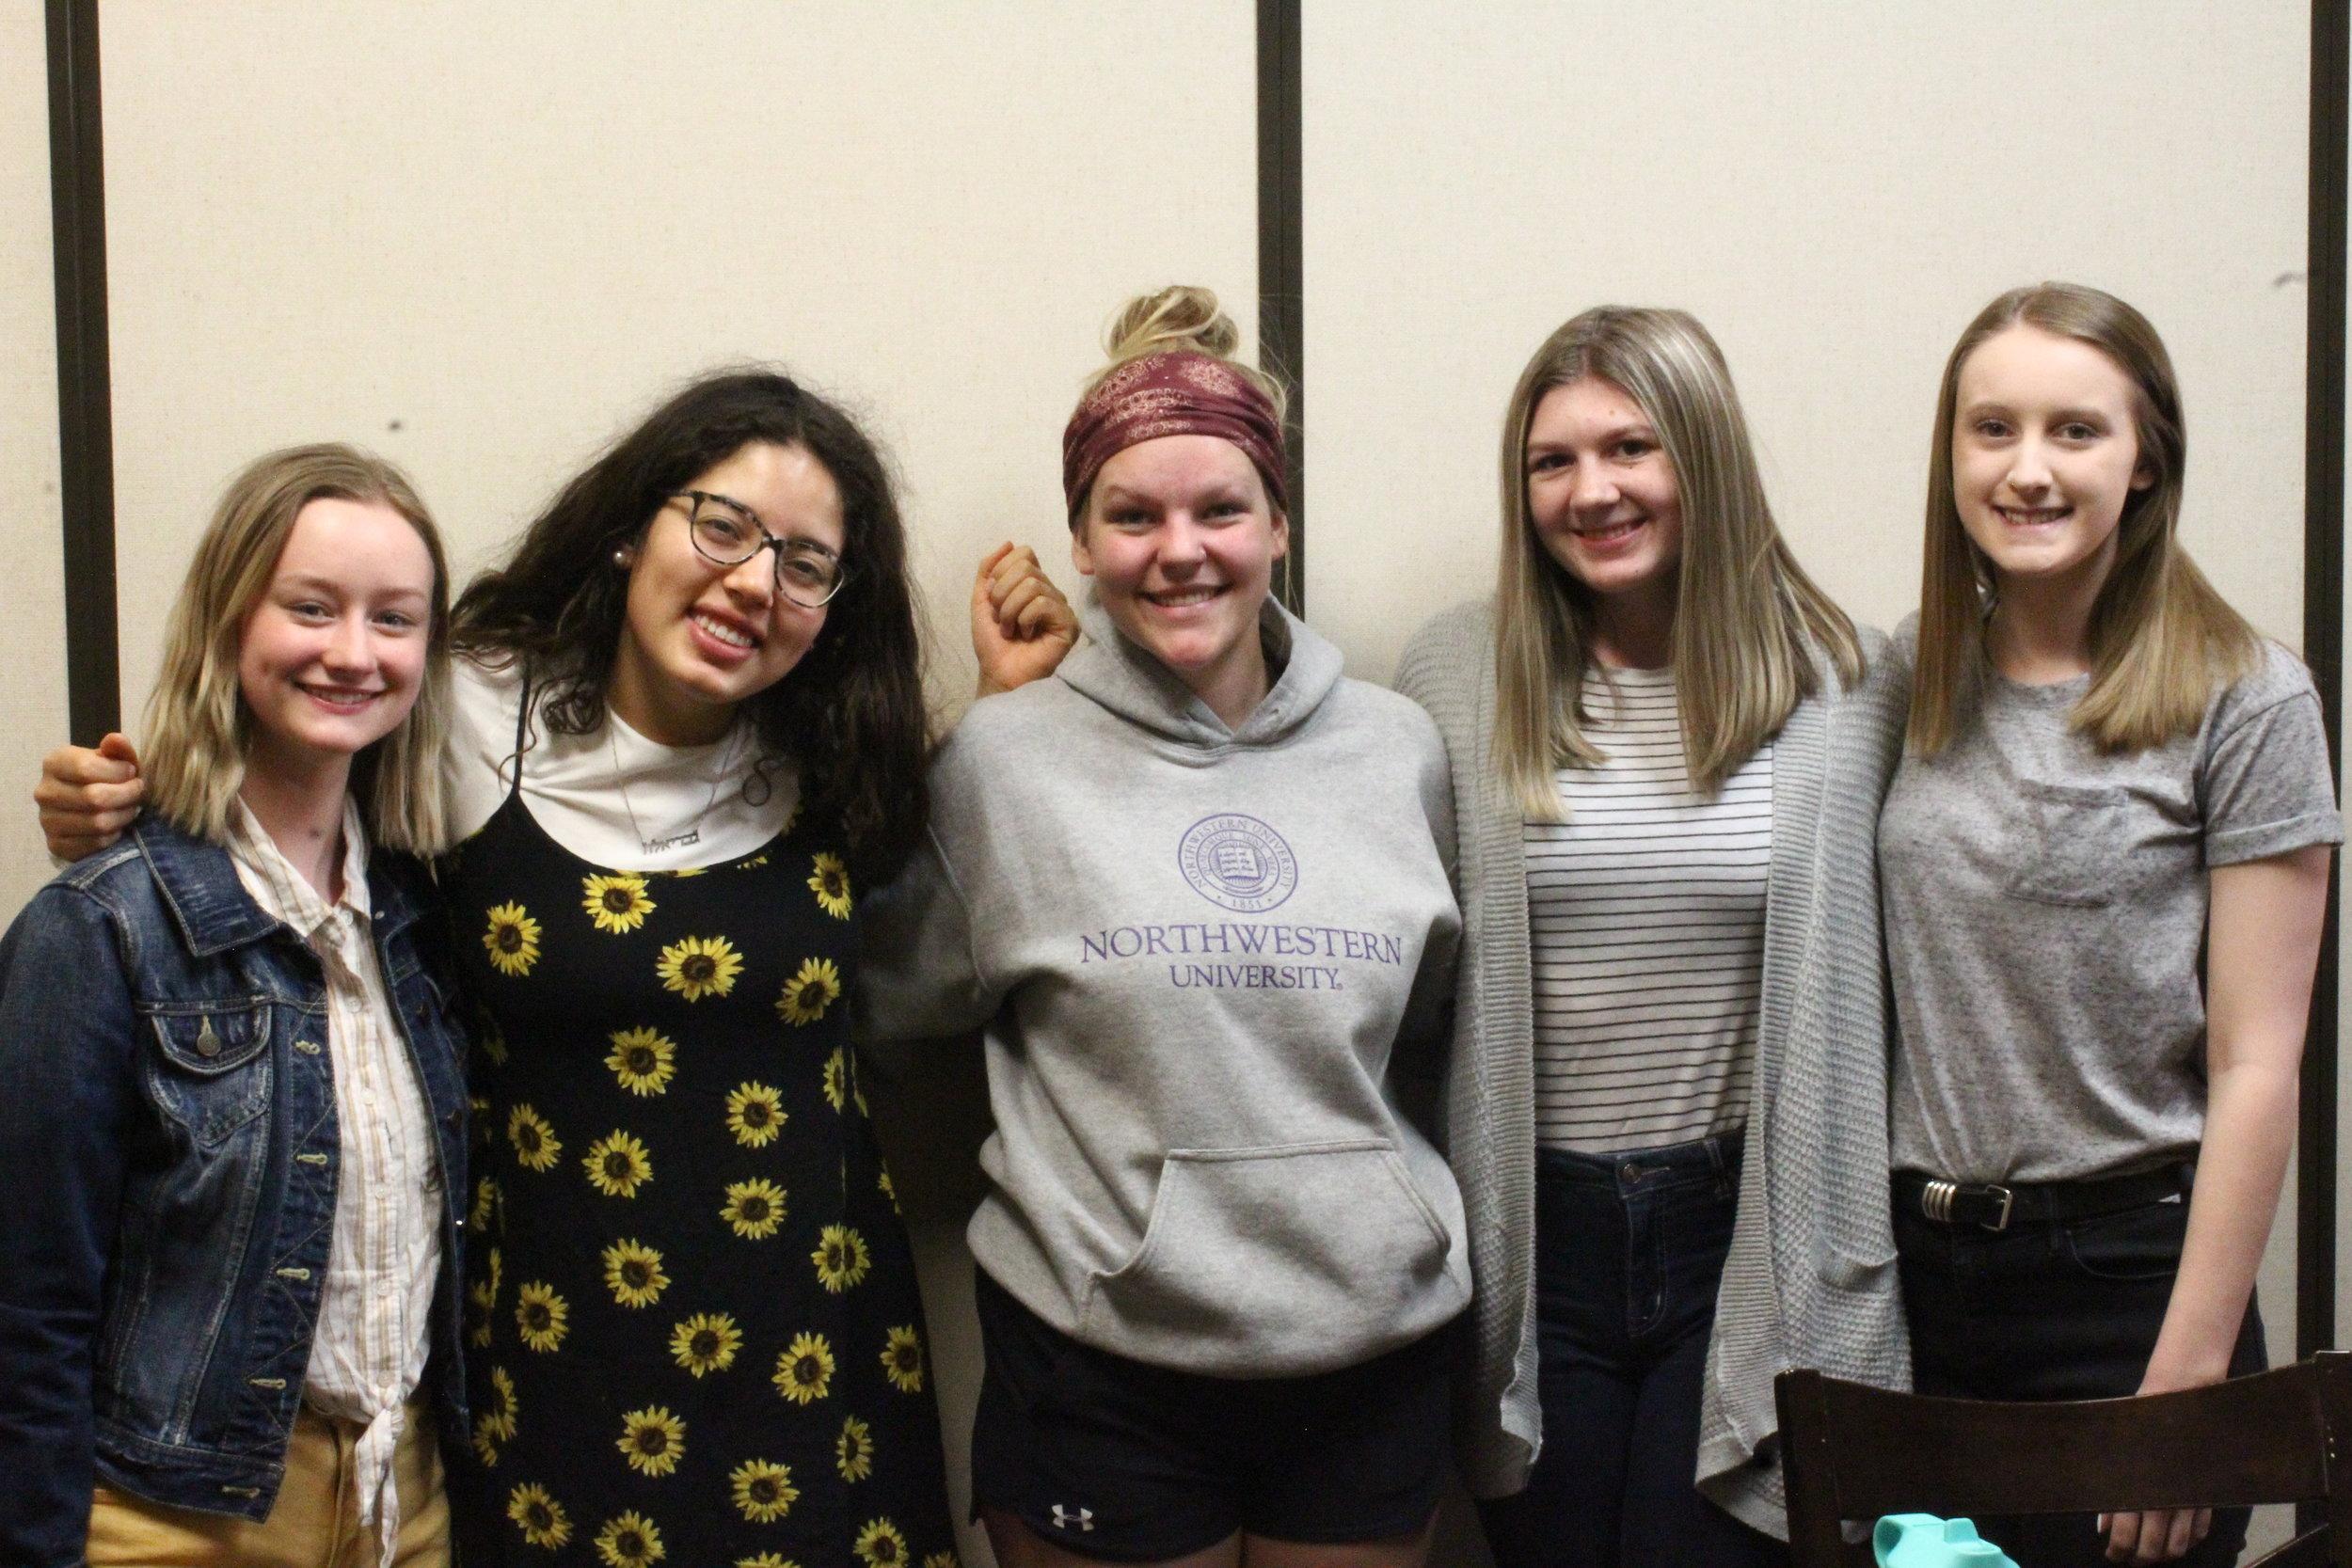 PHOTO: JORDAN CHAVEZ  L to R: Founders Rebecca Dilbeck, Gabriela Reitz, Annika Johnson, Katie Fry, and Johneth Price